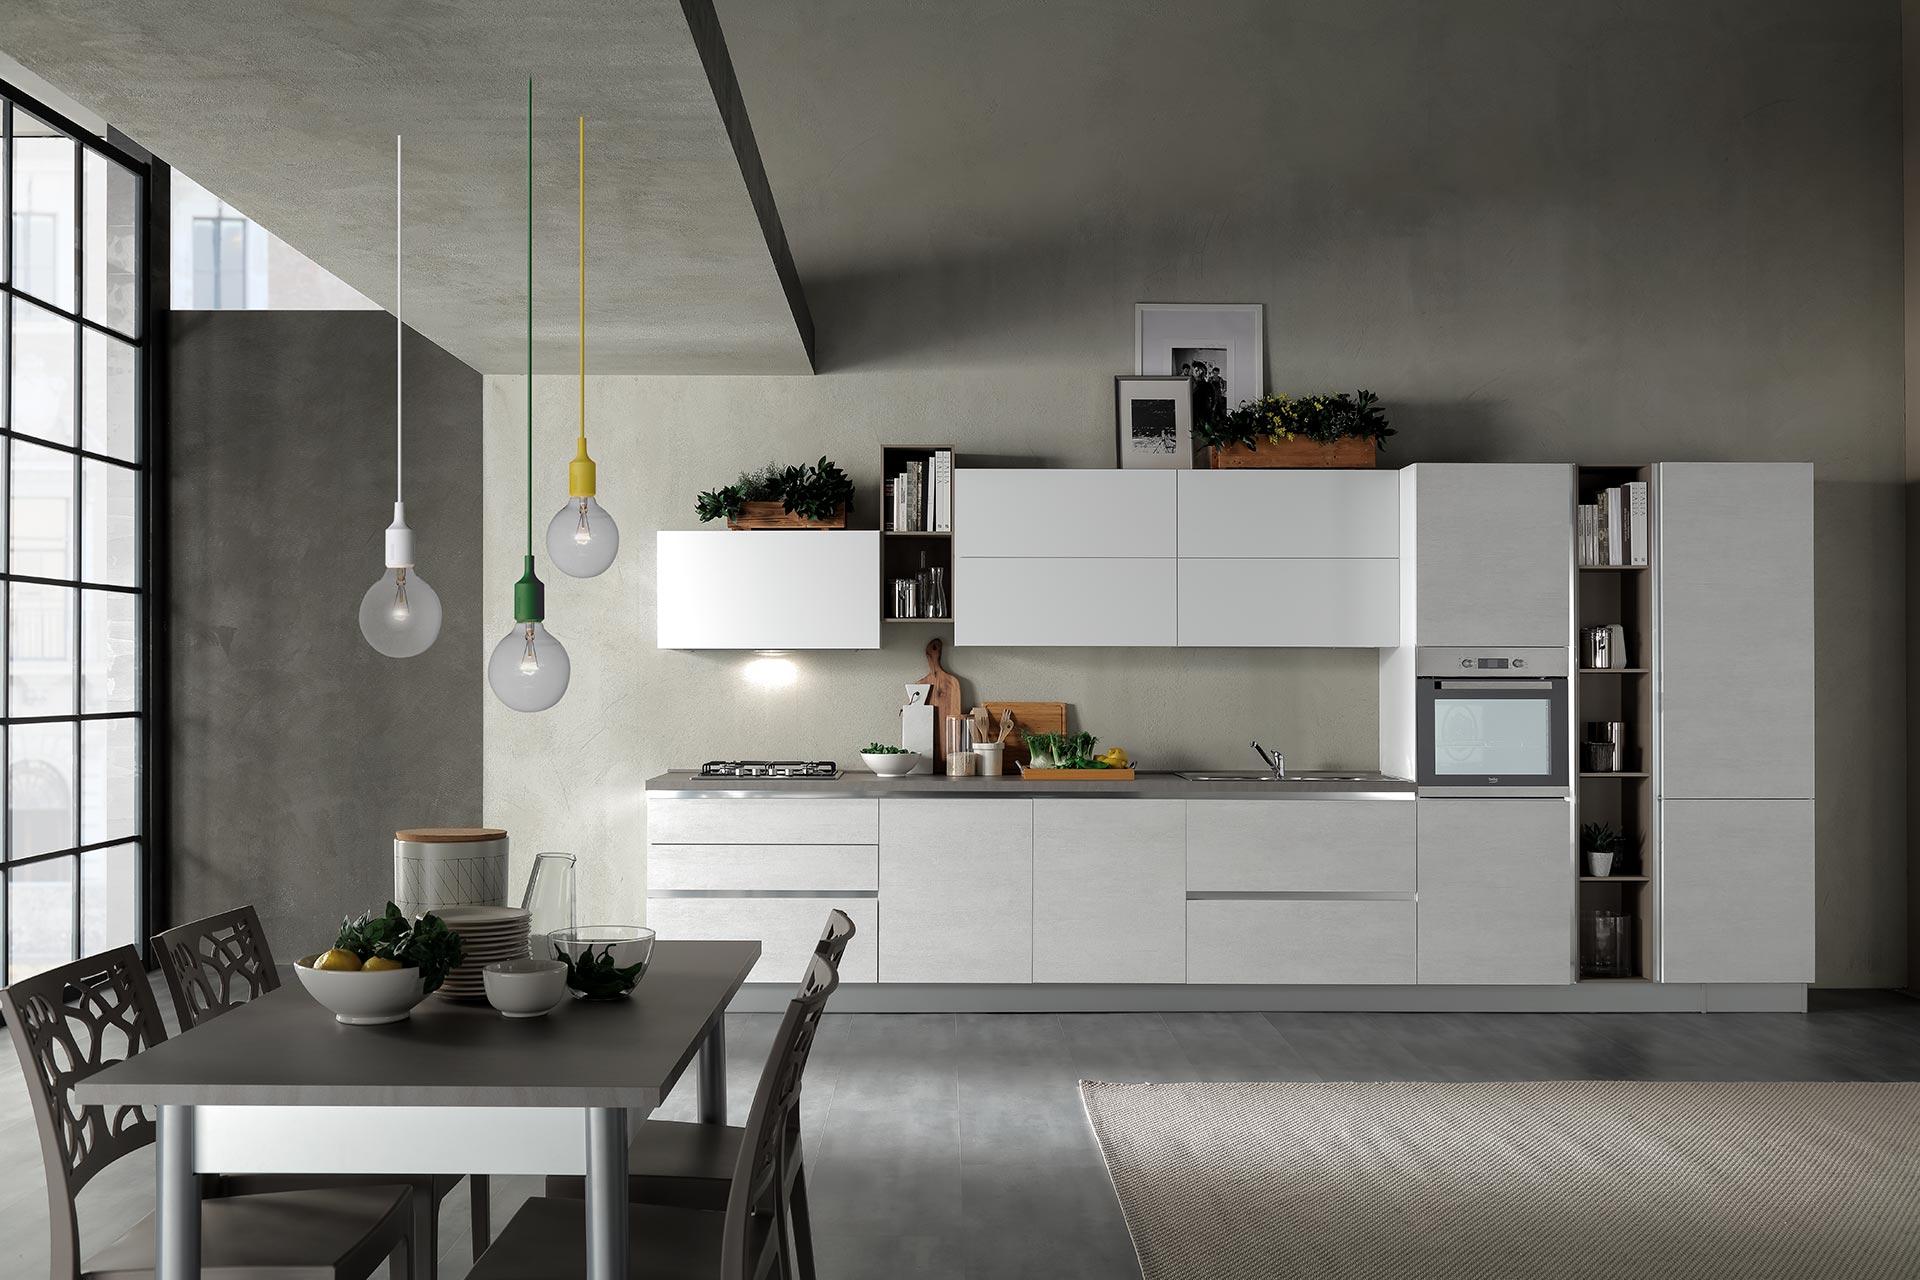 Cucine Moderne Bianco Grigio : Cucine rovere grigio e bianco cucina lube bianca e grigia cucina